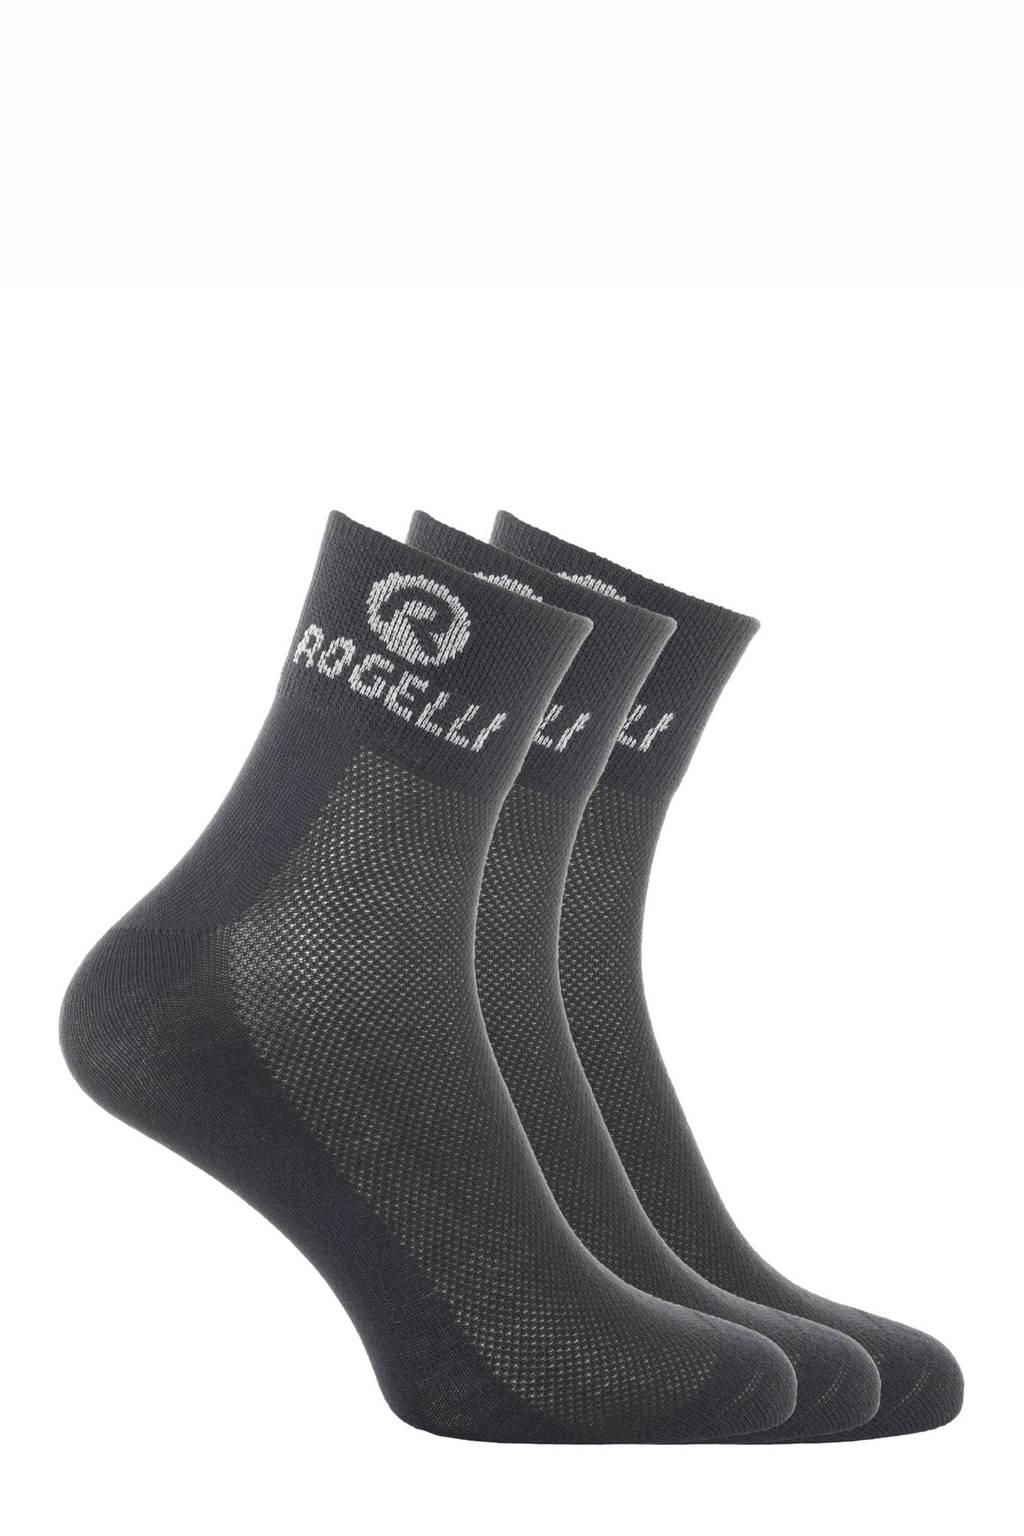 Rogelli   sportsokken Promo - set van 3 zwart, Zwart